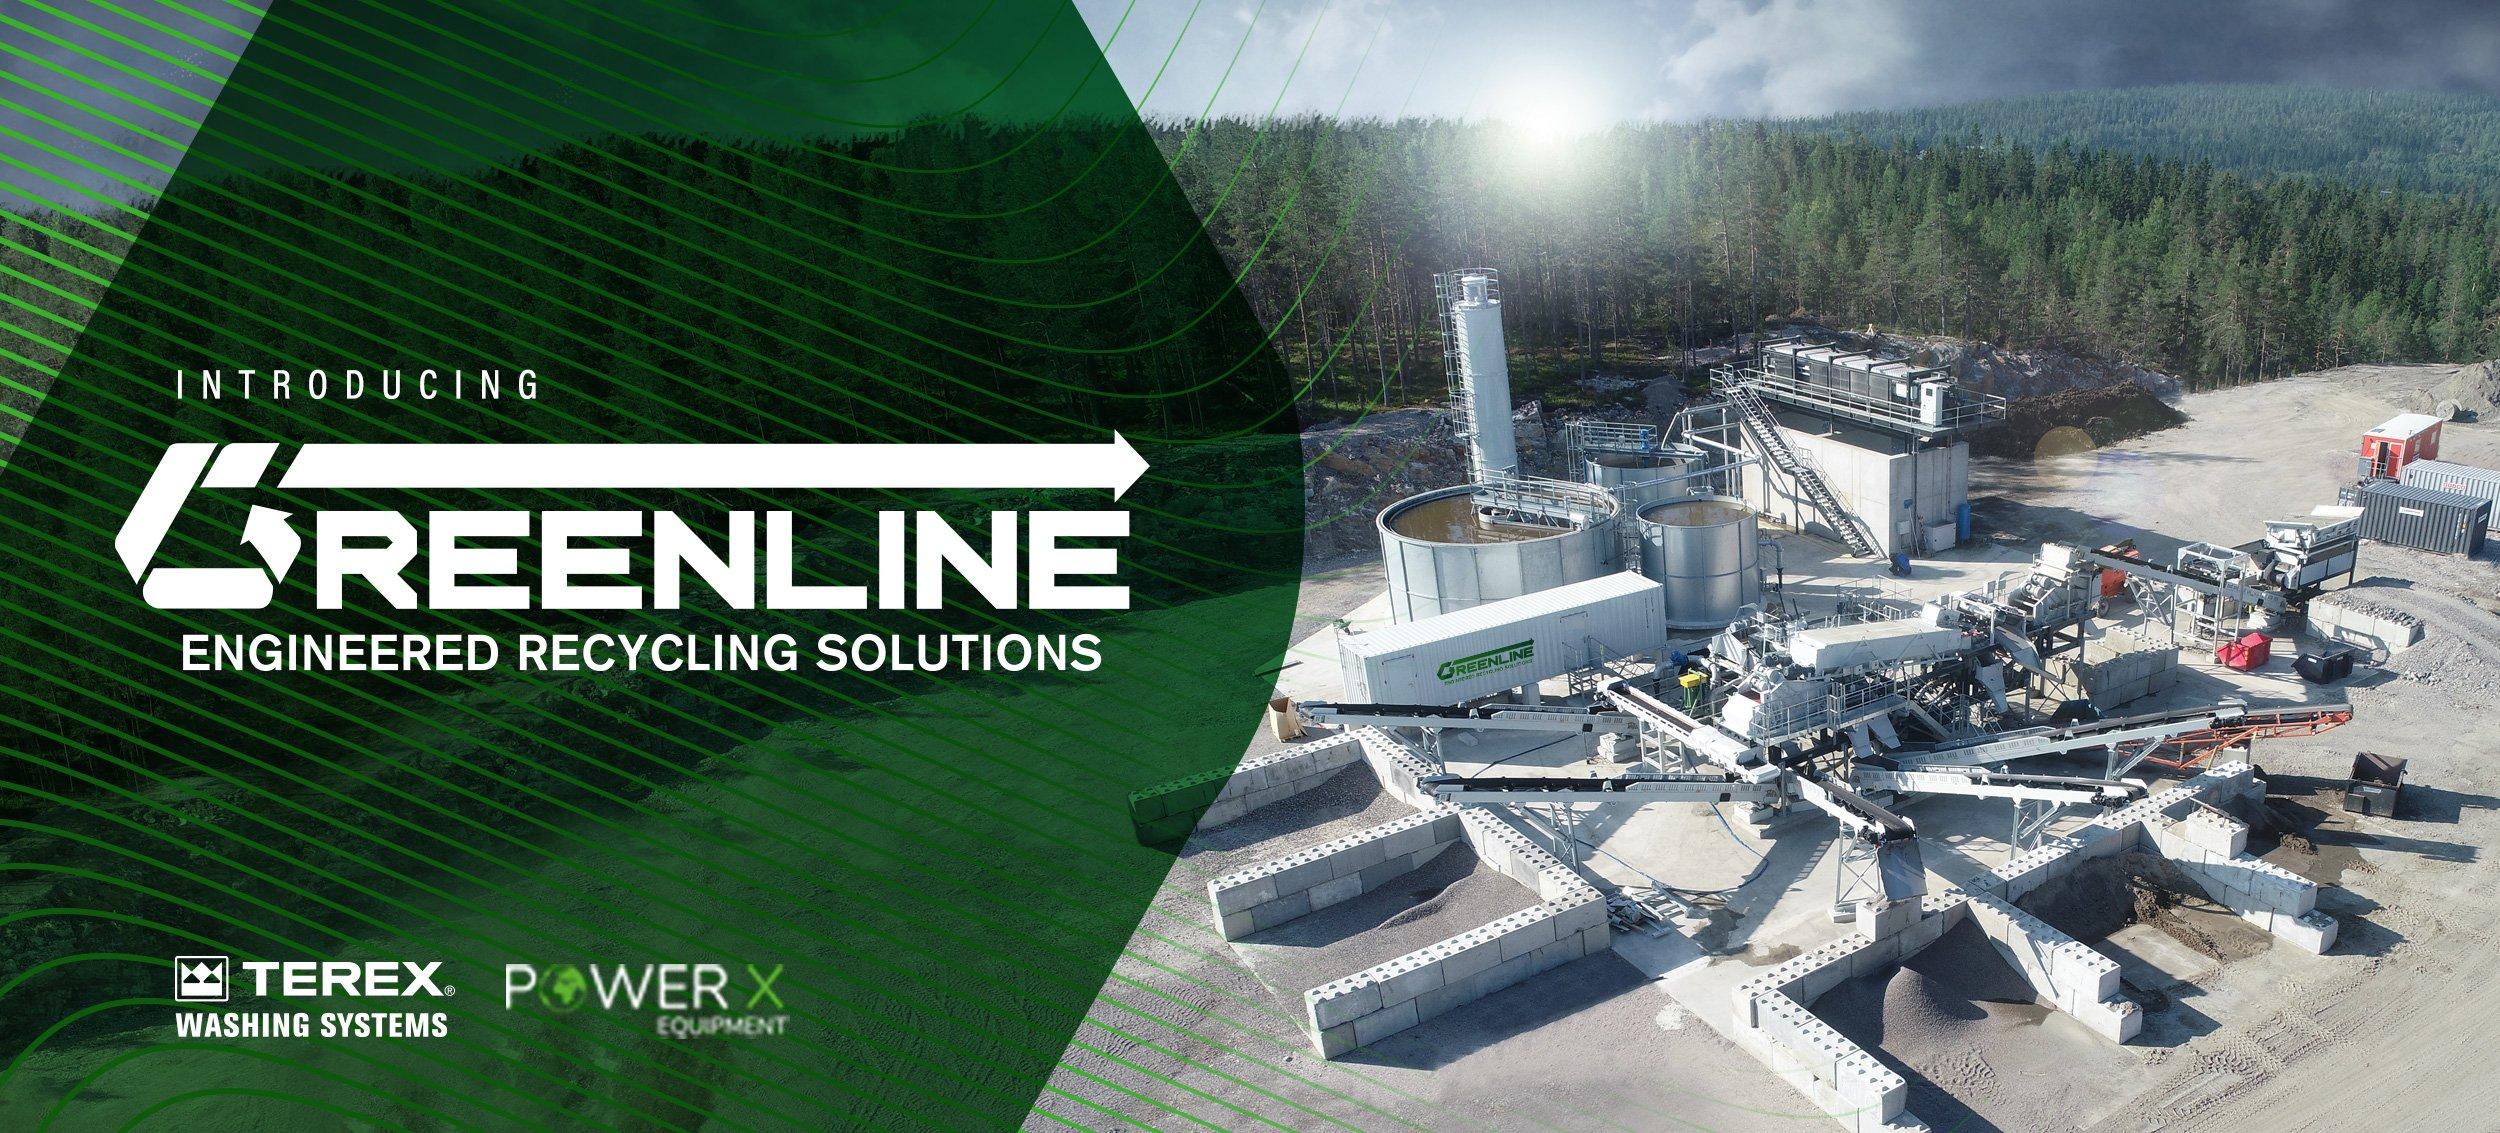 Greenline_Power-X